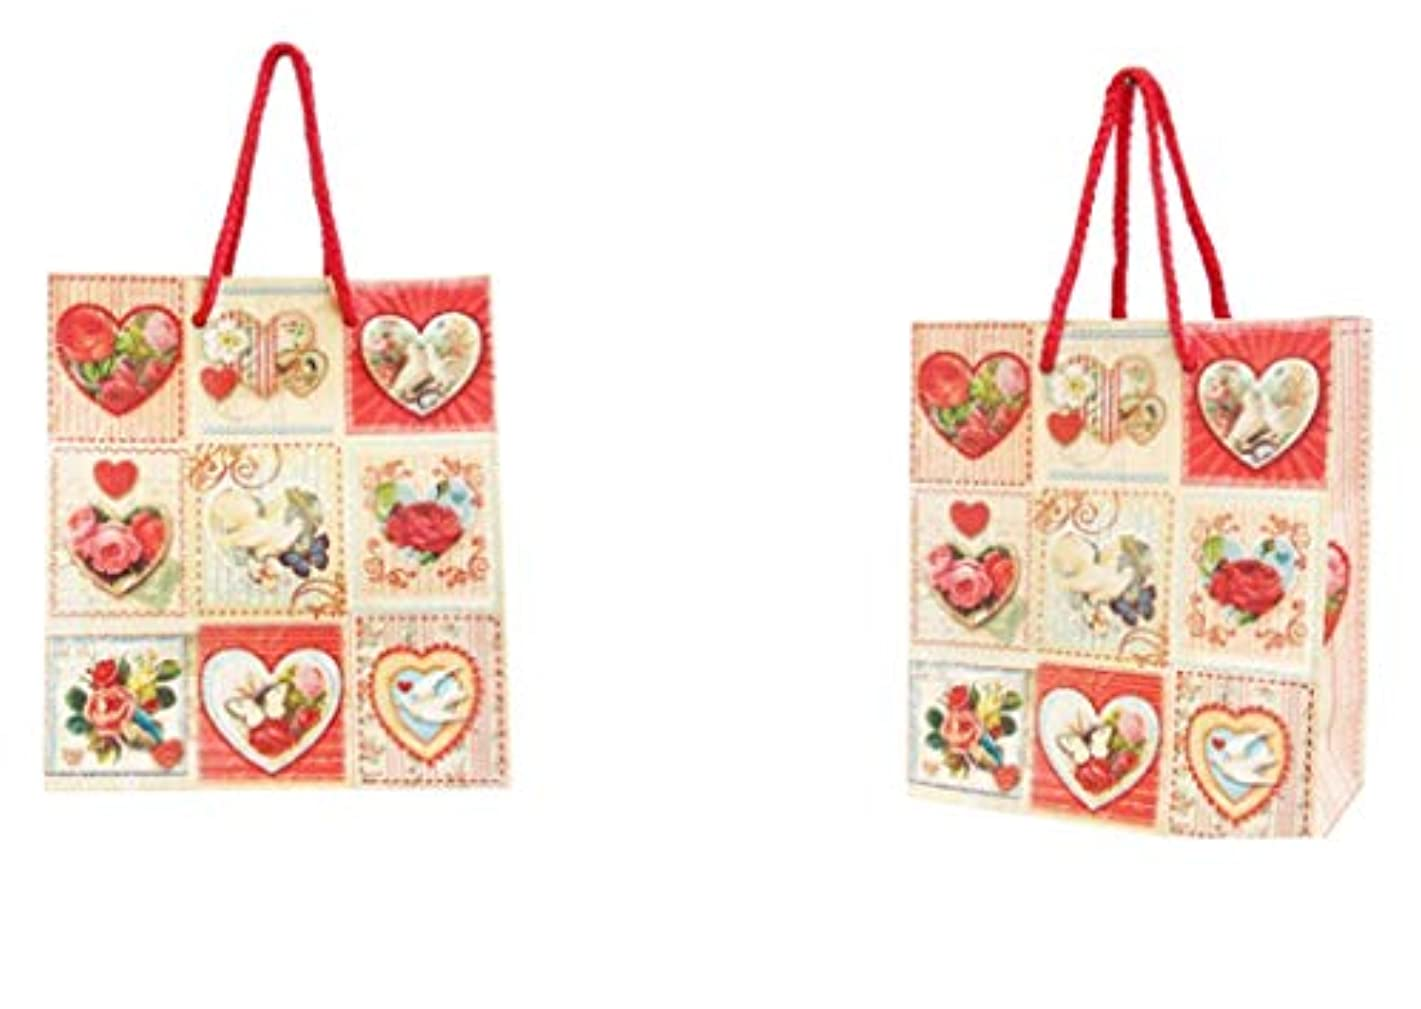 Punch Studio Vertical Glitter Embellished Gift Bags ~ Vintage Victorian Heart Squares 56028, Set of 2